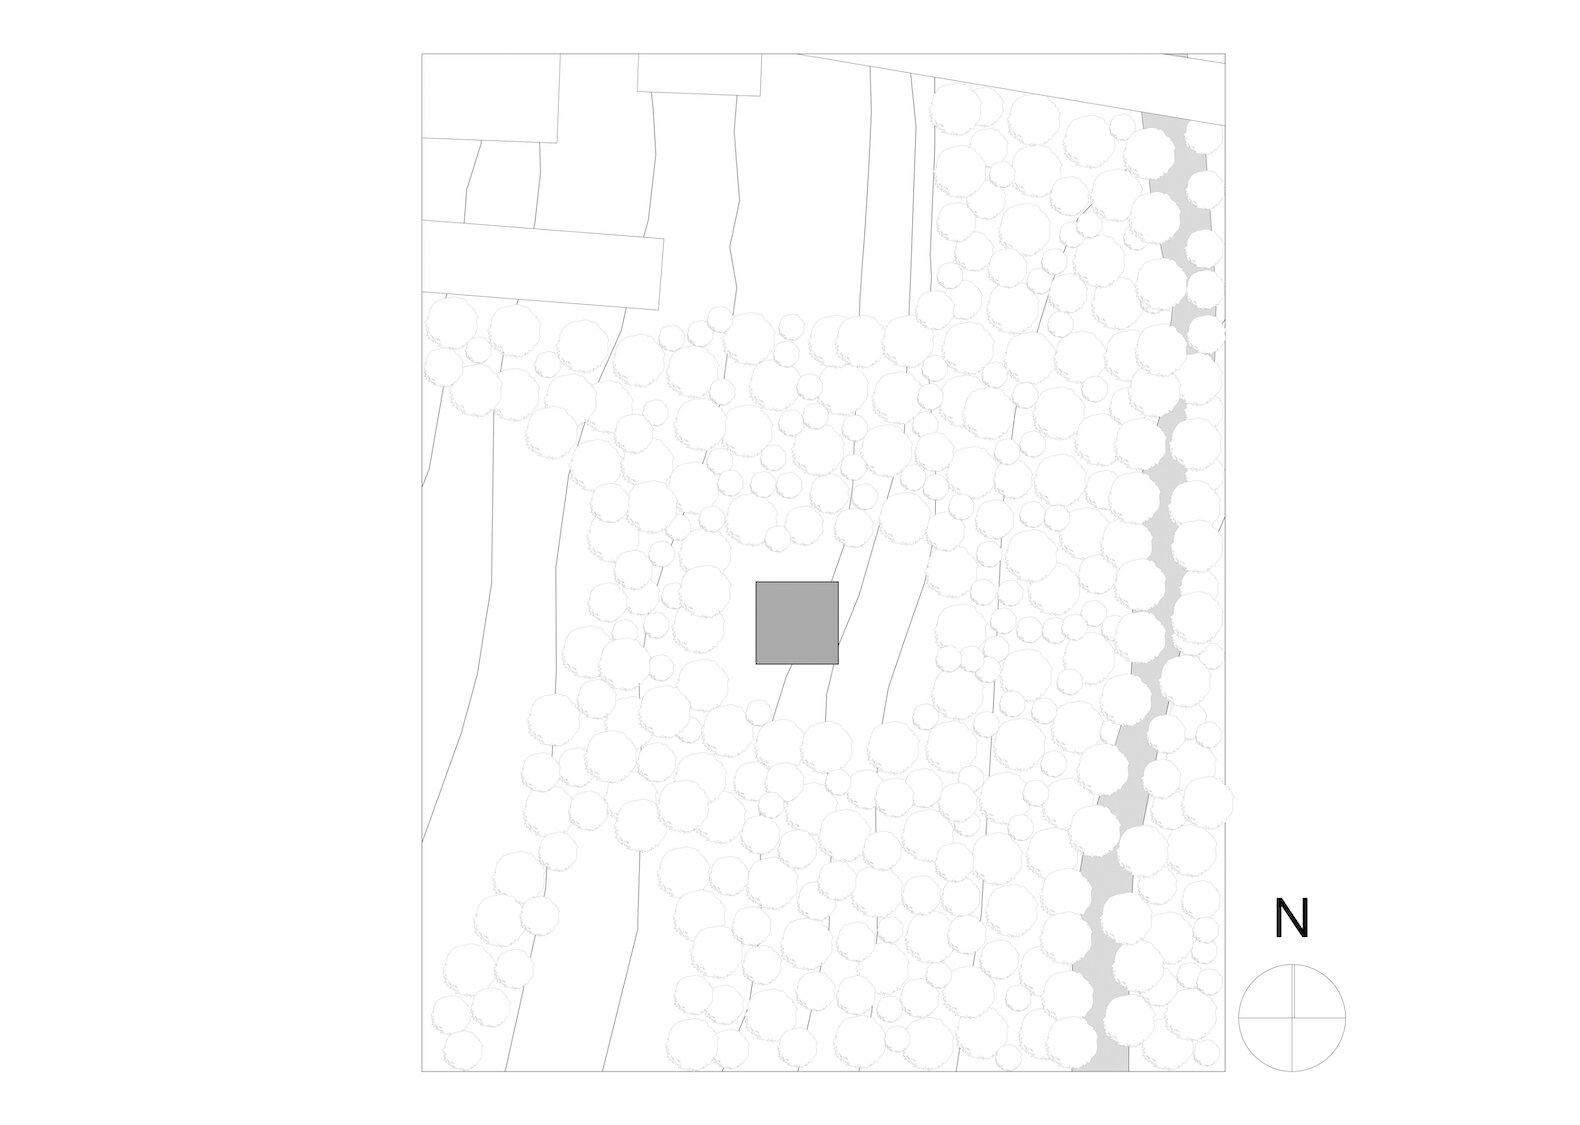 Refugio 3 x 3 site plan